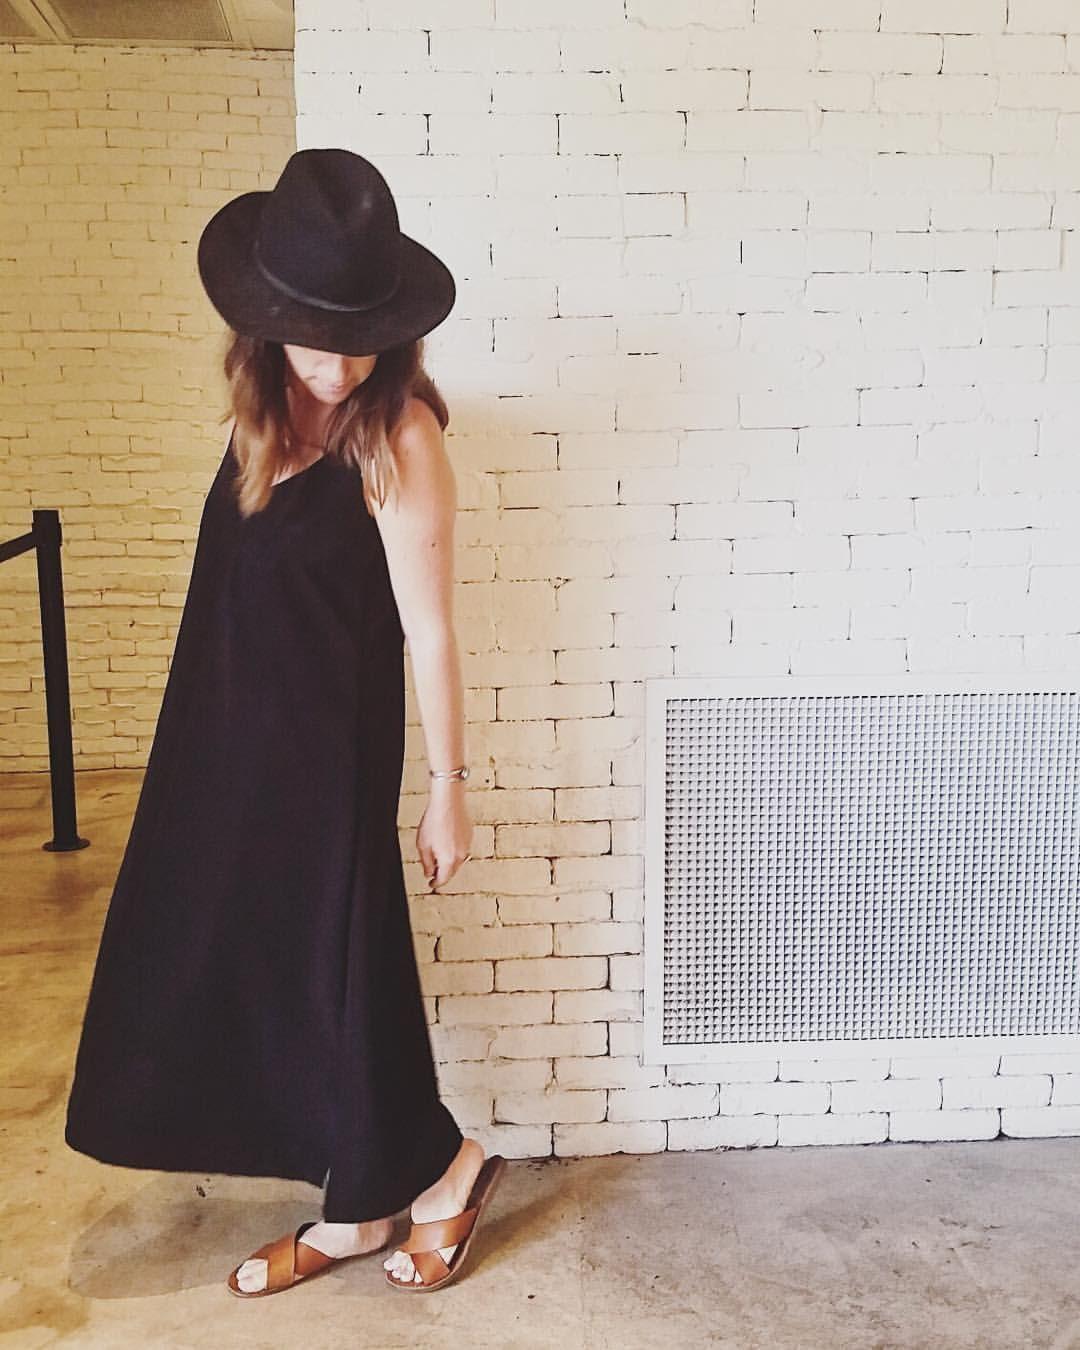 192 Likes 10 Comments Tiffany Lano Tiffanylano On Instagram